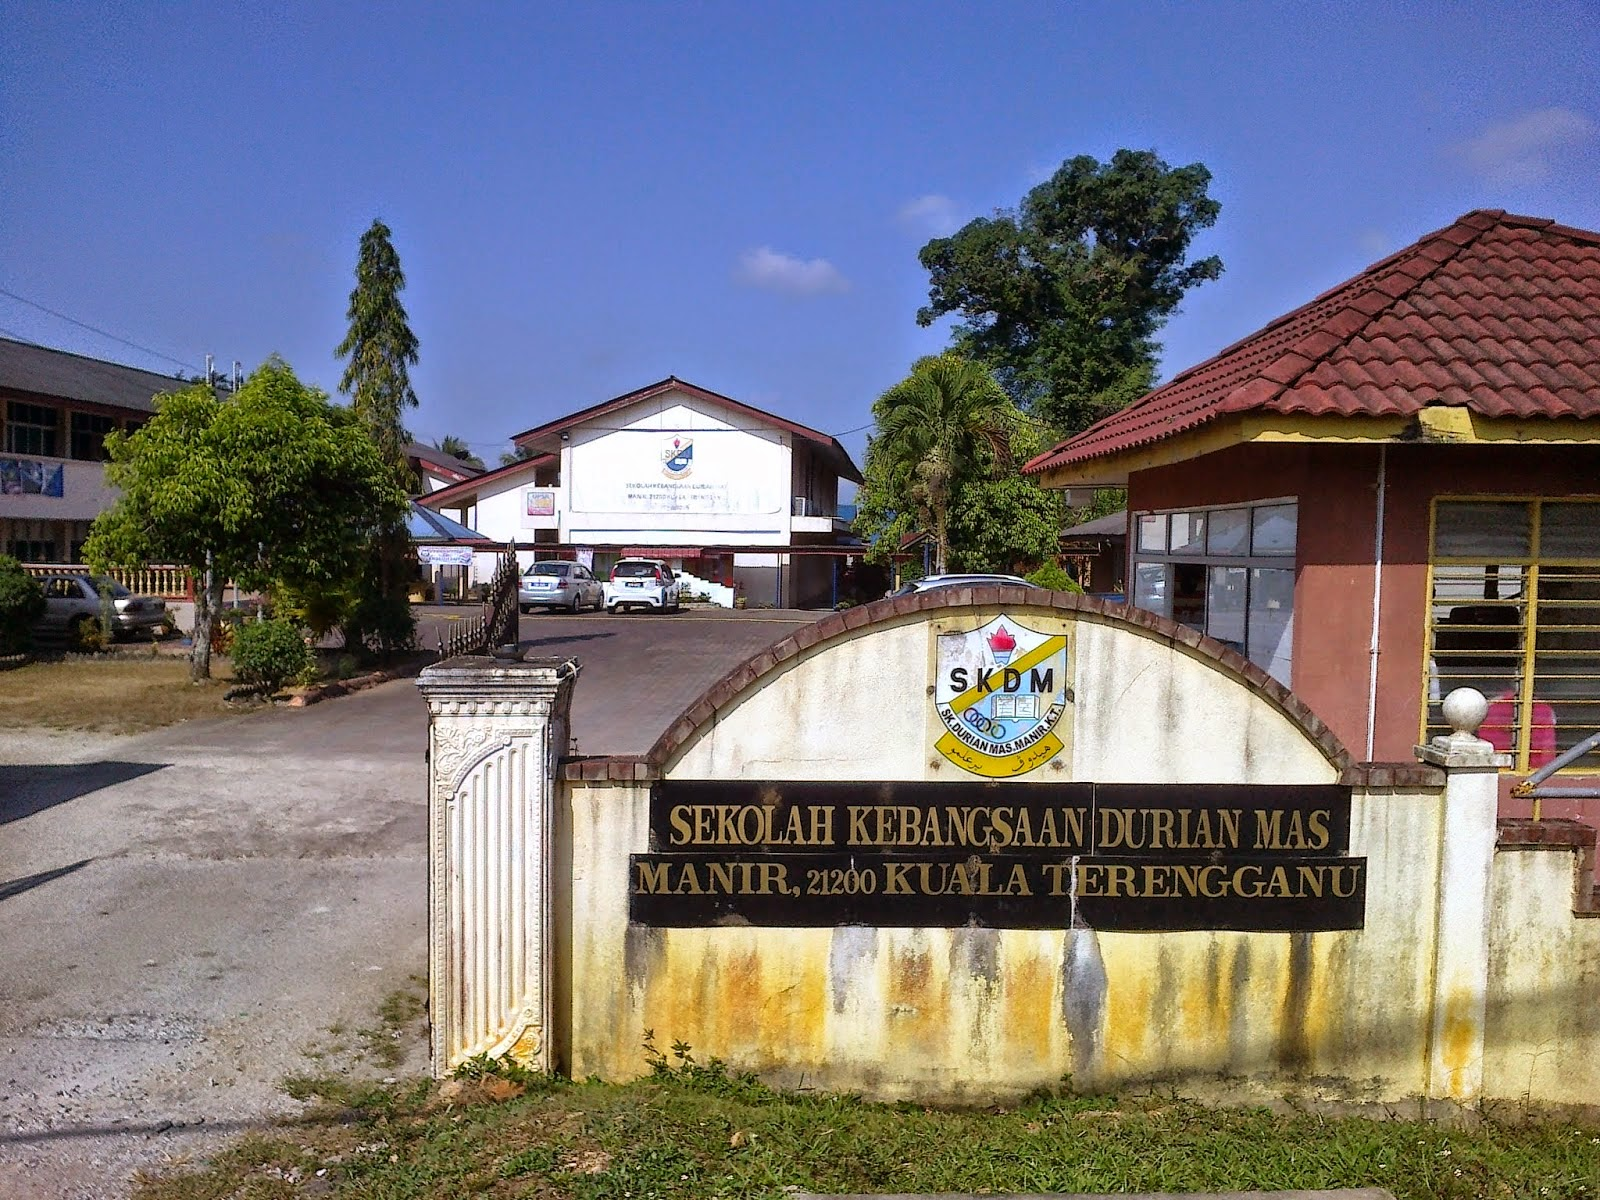 SK Durian Mas